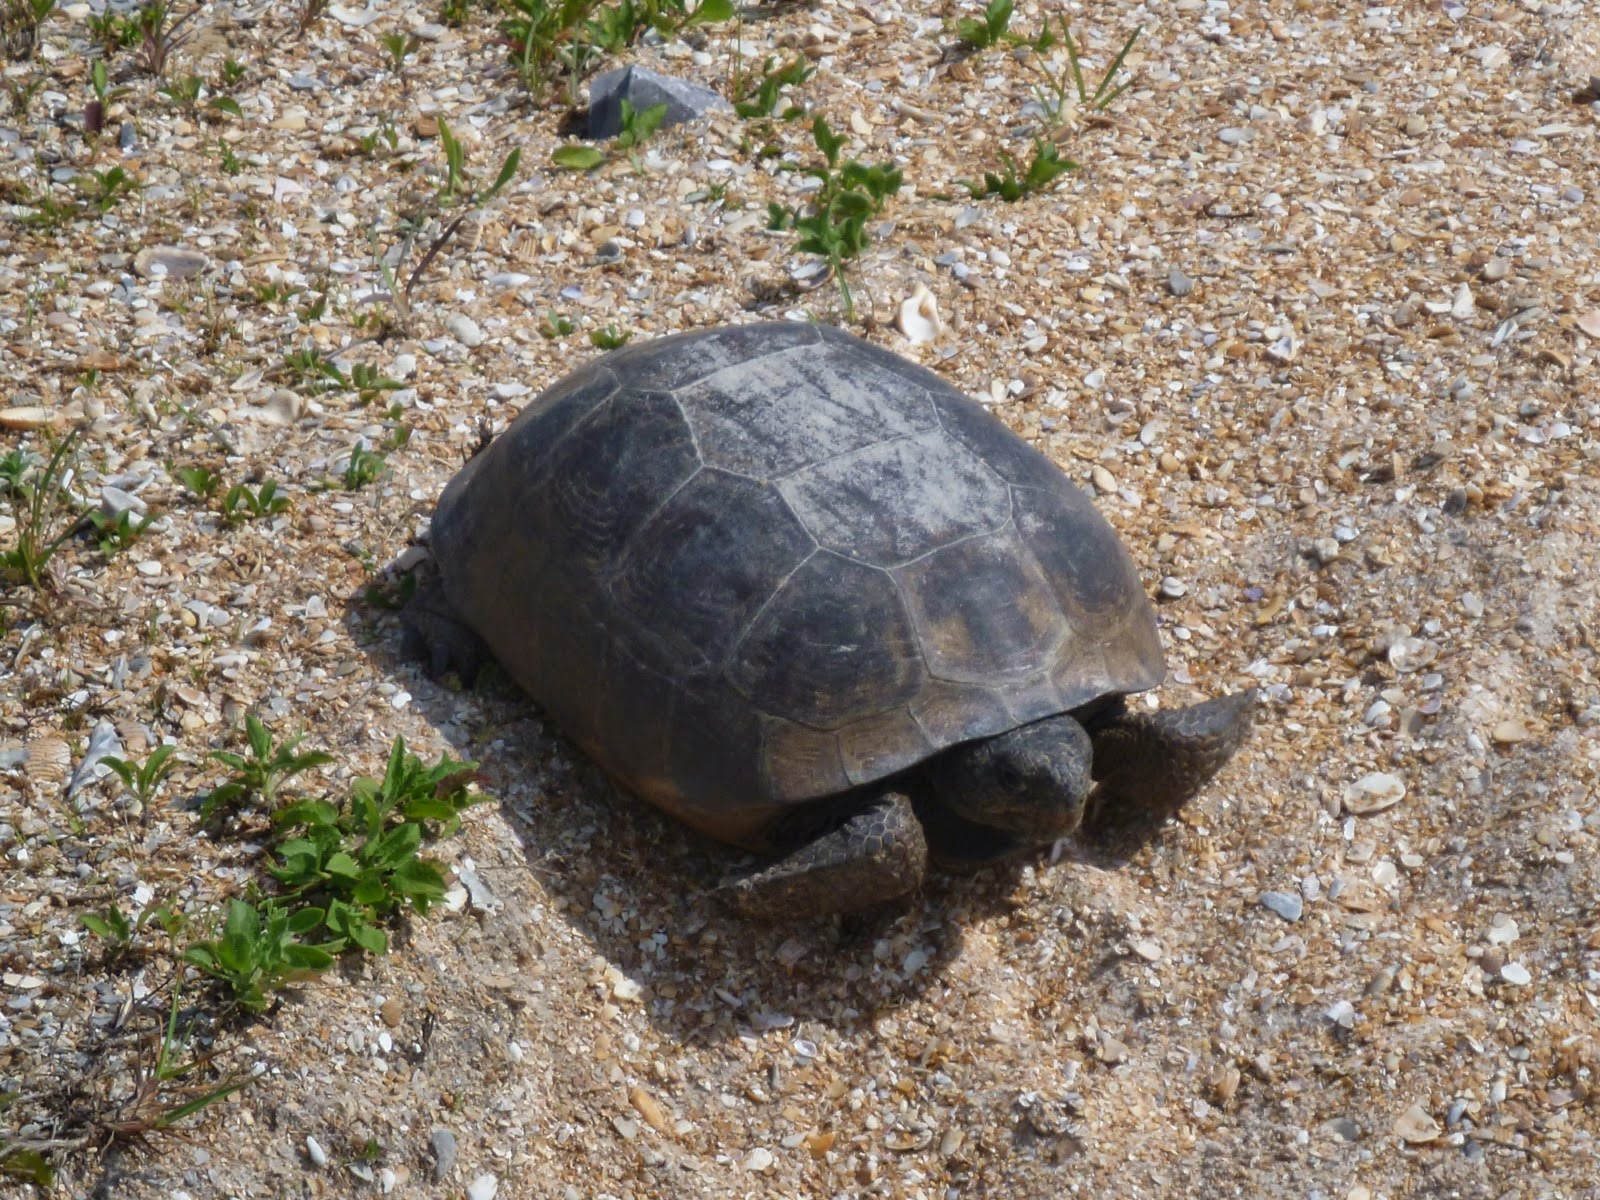 American Gopher Tortoise